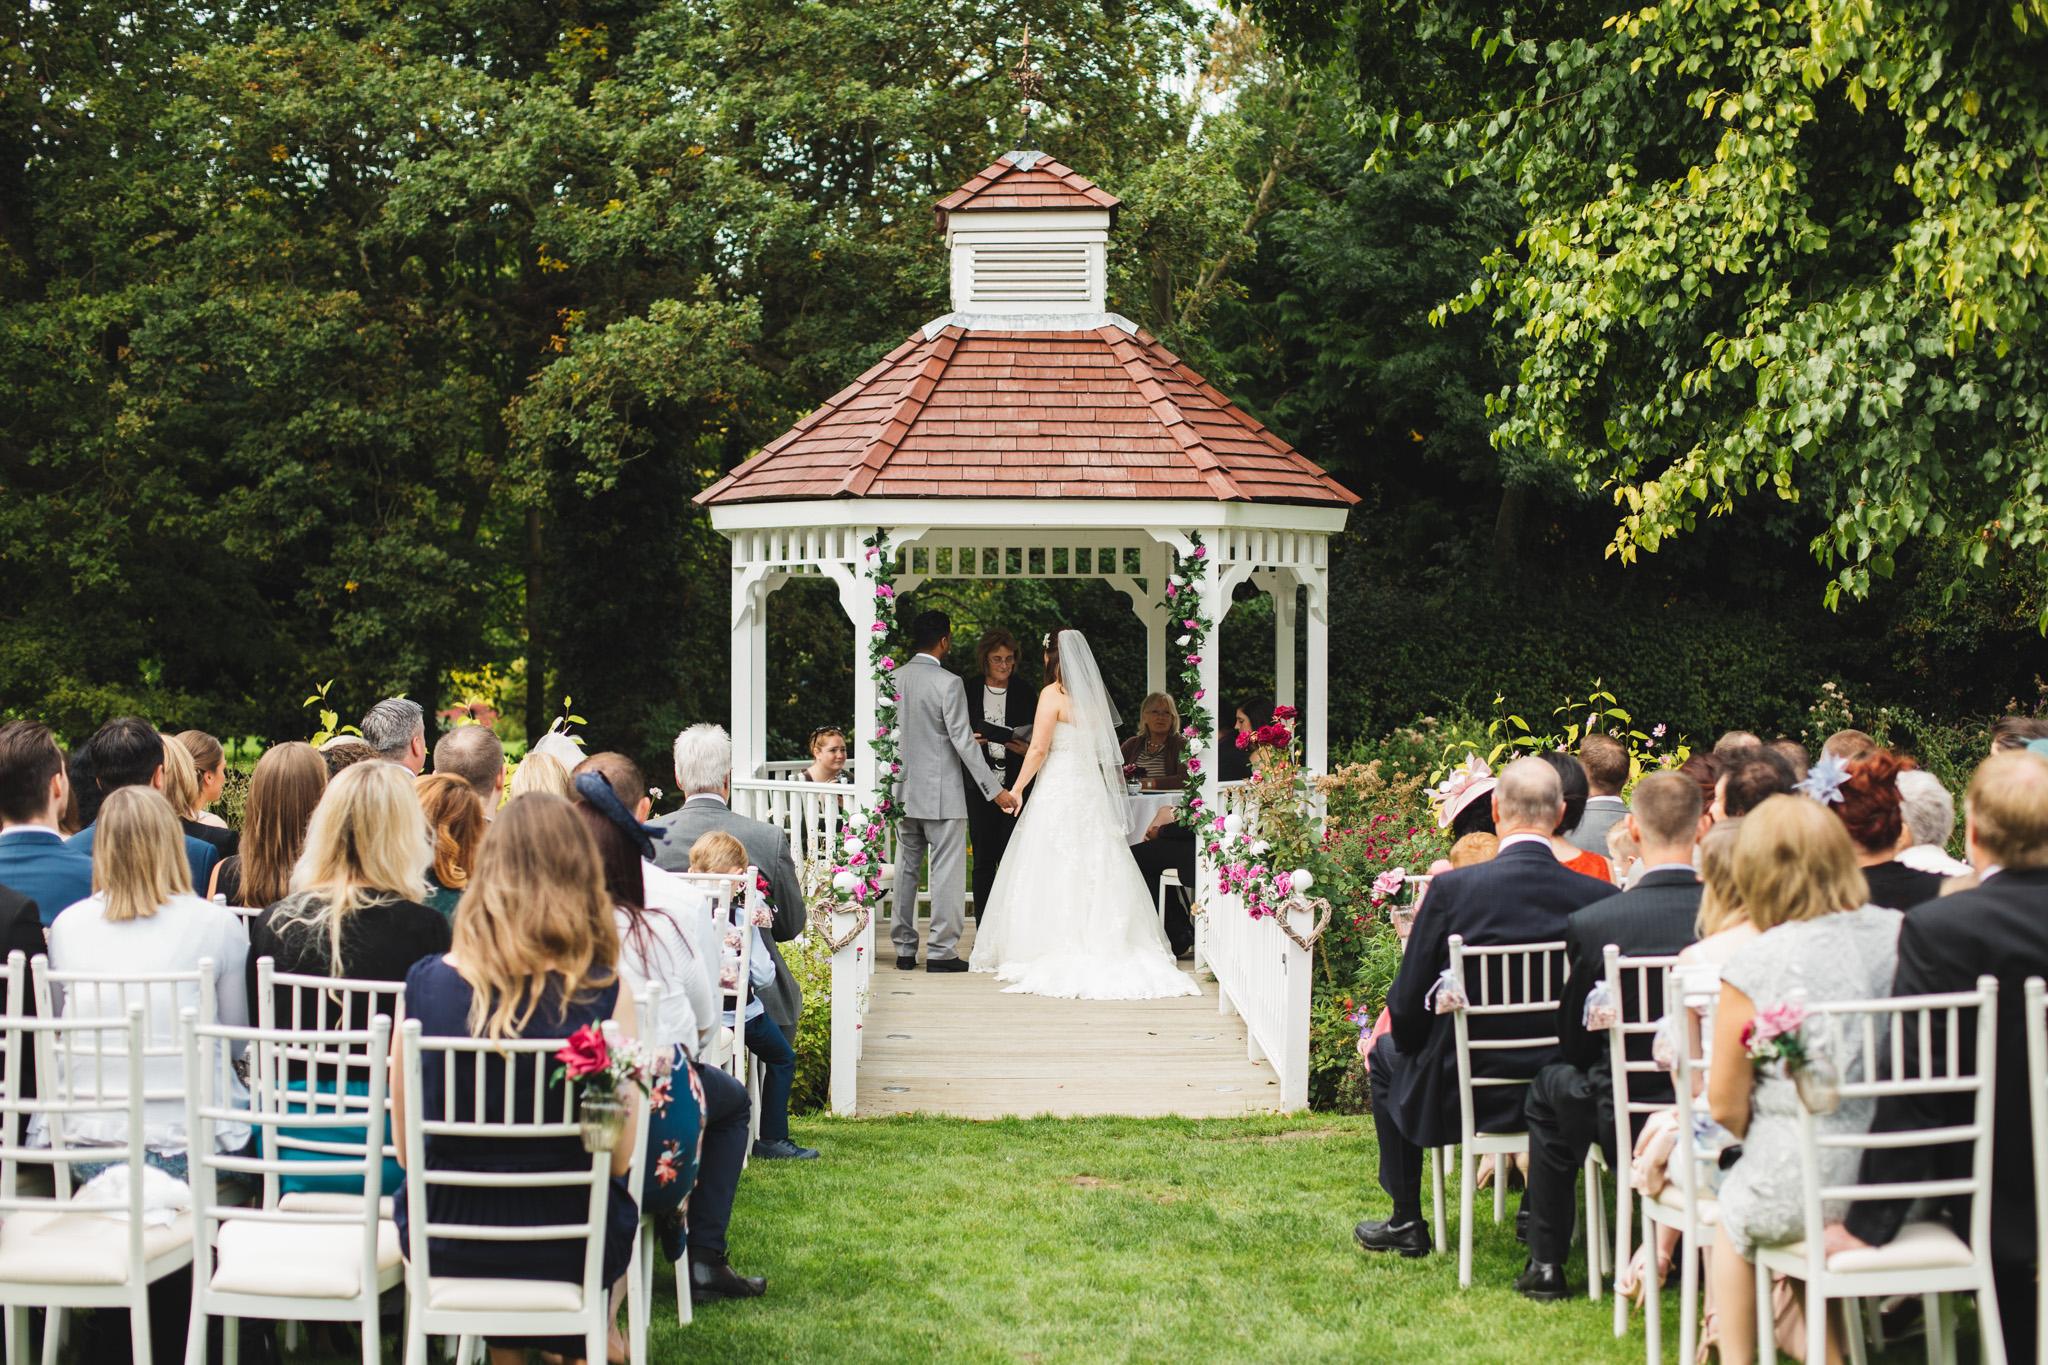 cat-lane-weddings__sheene-mill-wedding-photography__clw__1418_4G2A2924.jpg